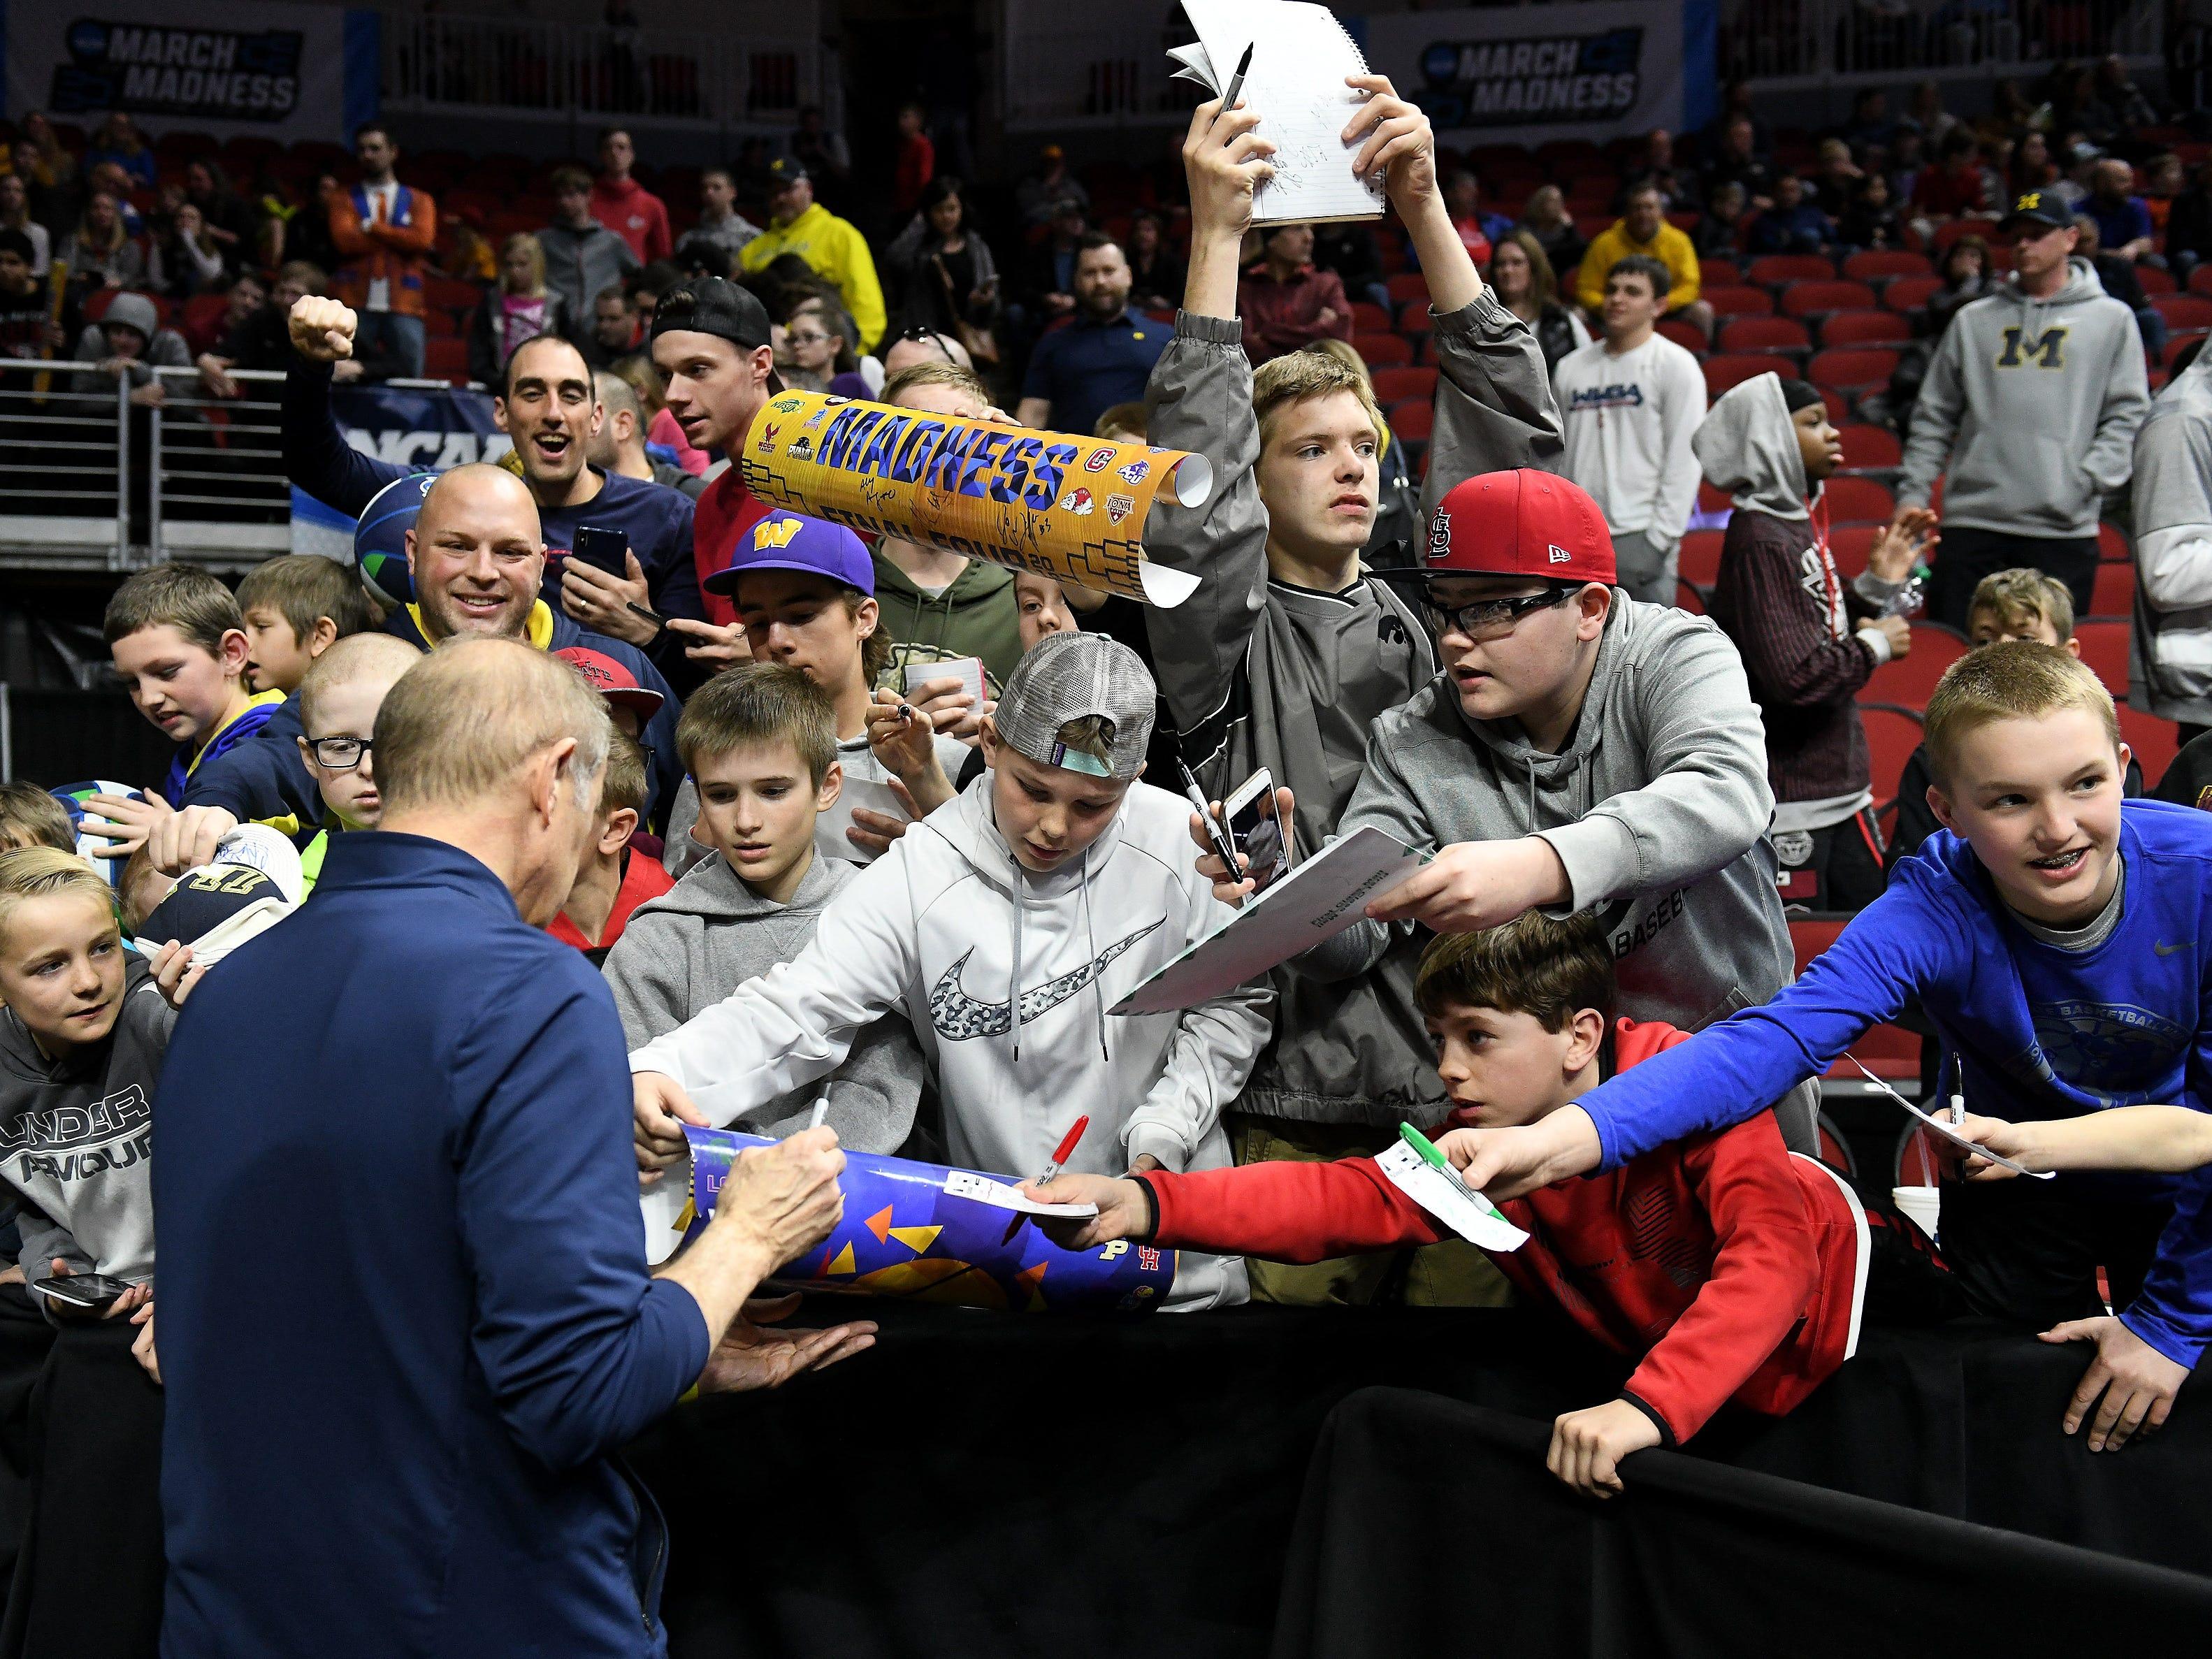 Michigan head coach John Beilein signs autographs.